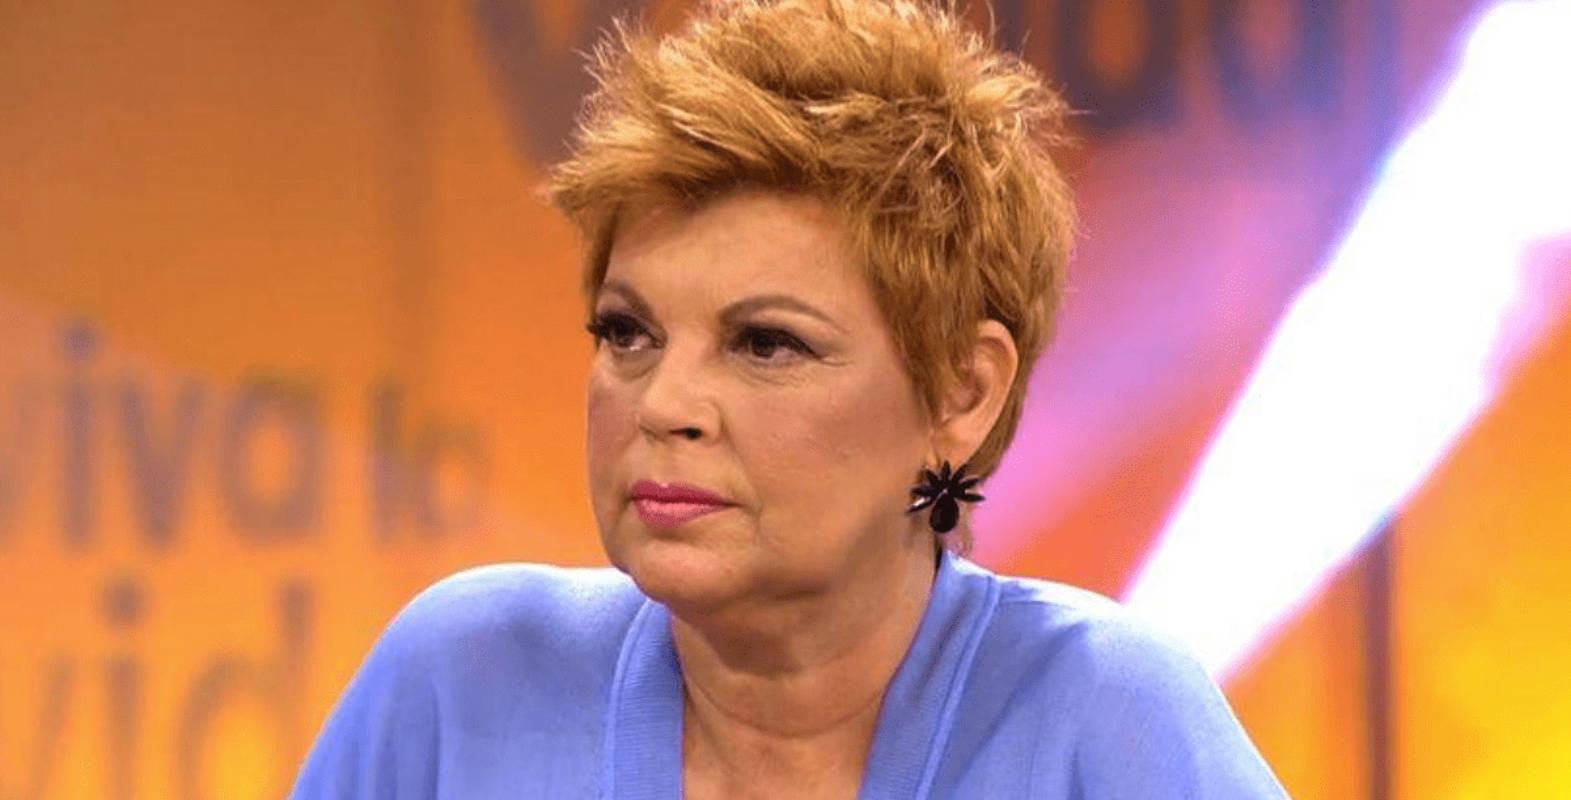 Terelu Campos mostra la seva preocupació per la mare a 'Viva la vida' / Telecinco